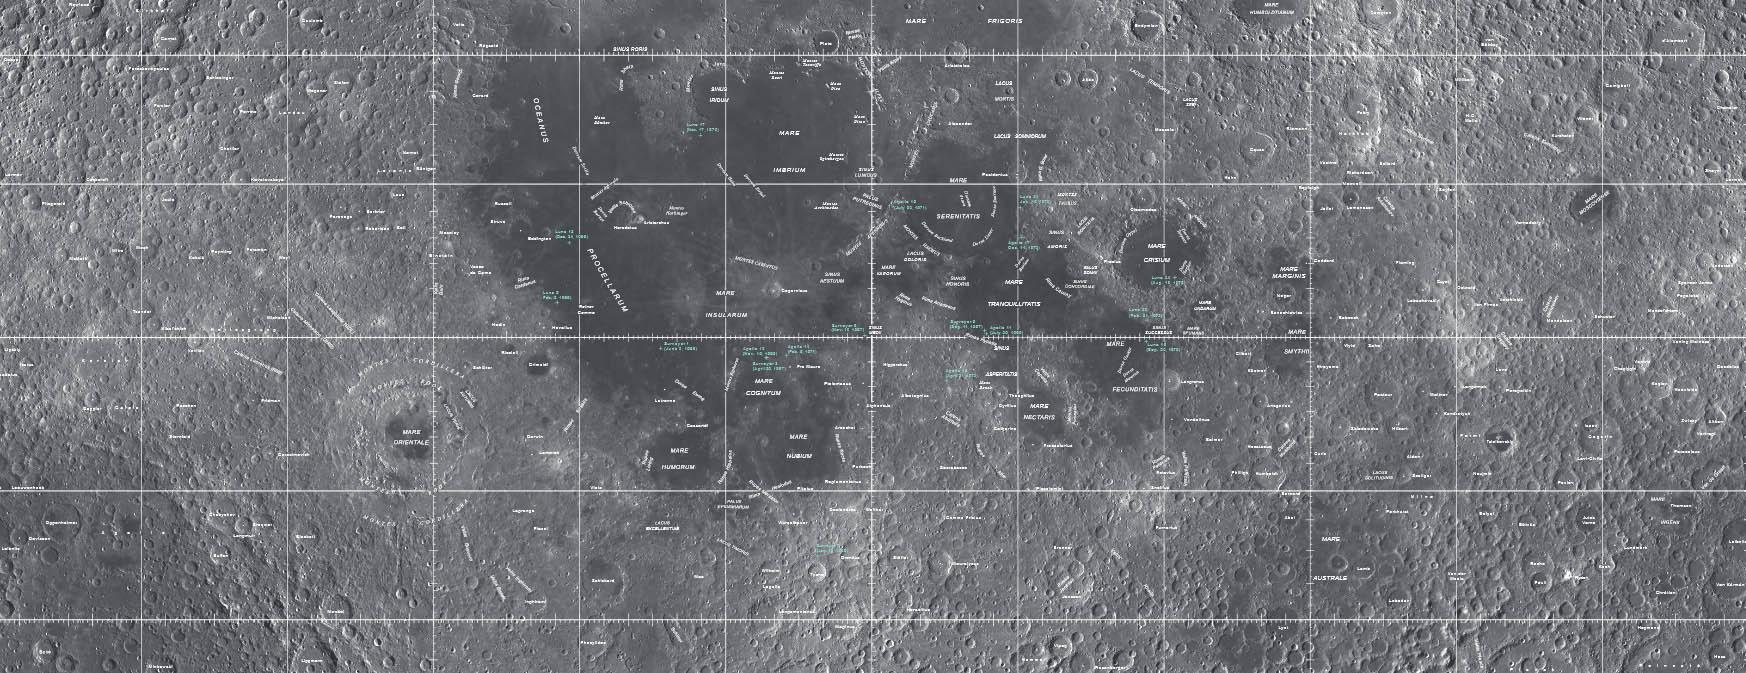 USGS Lunar Map (visual version)